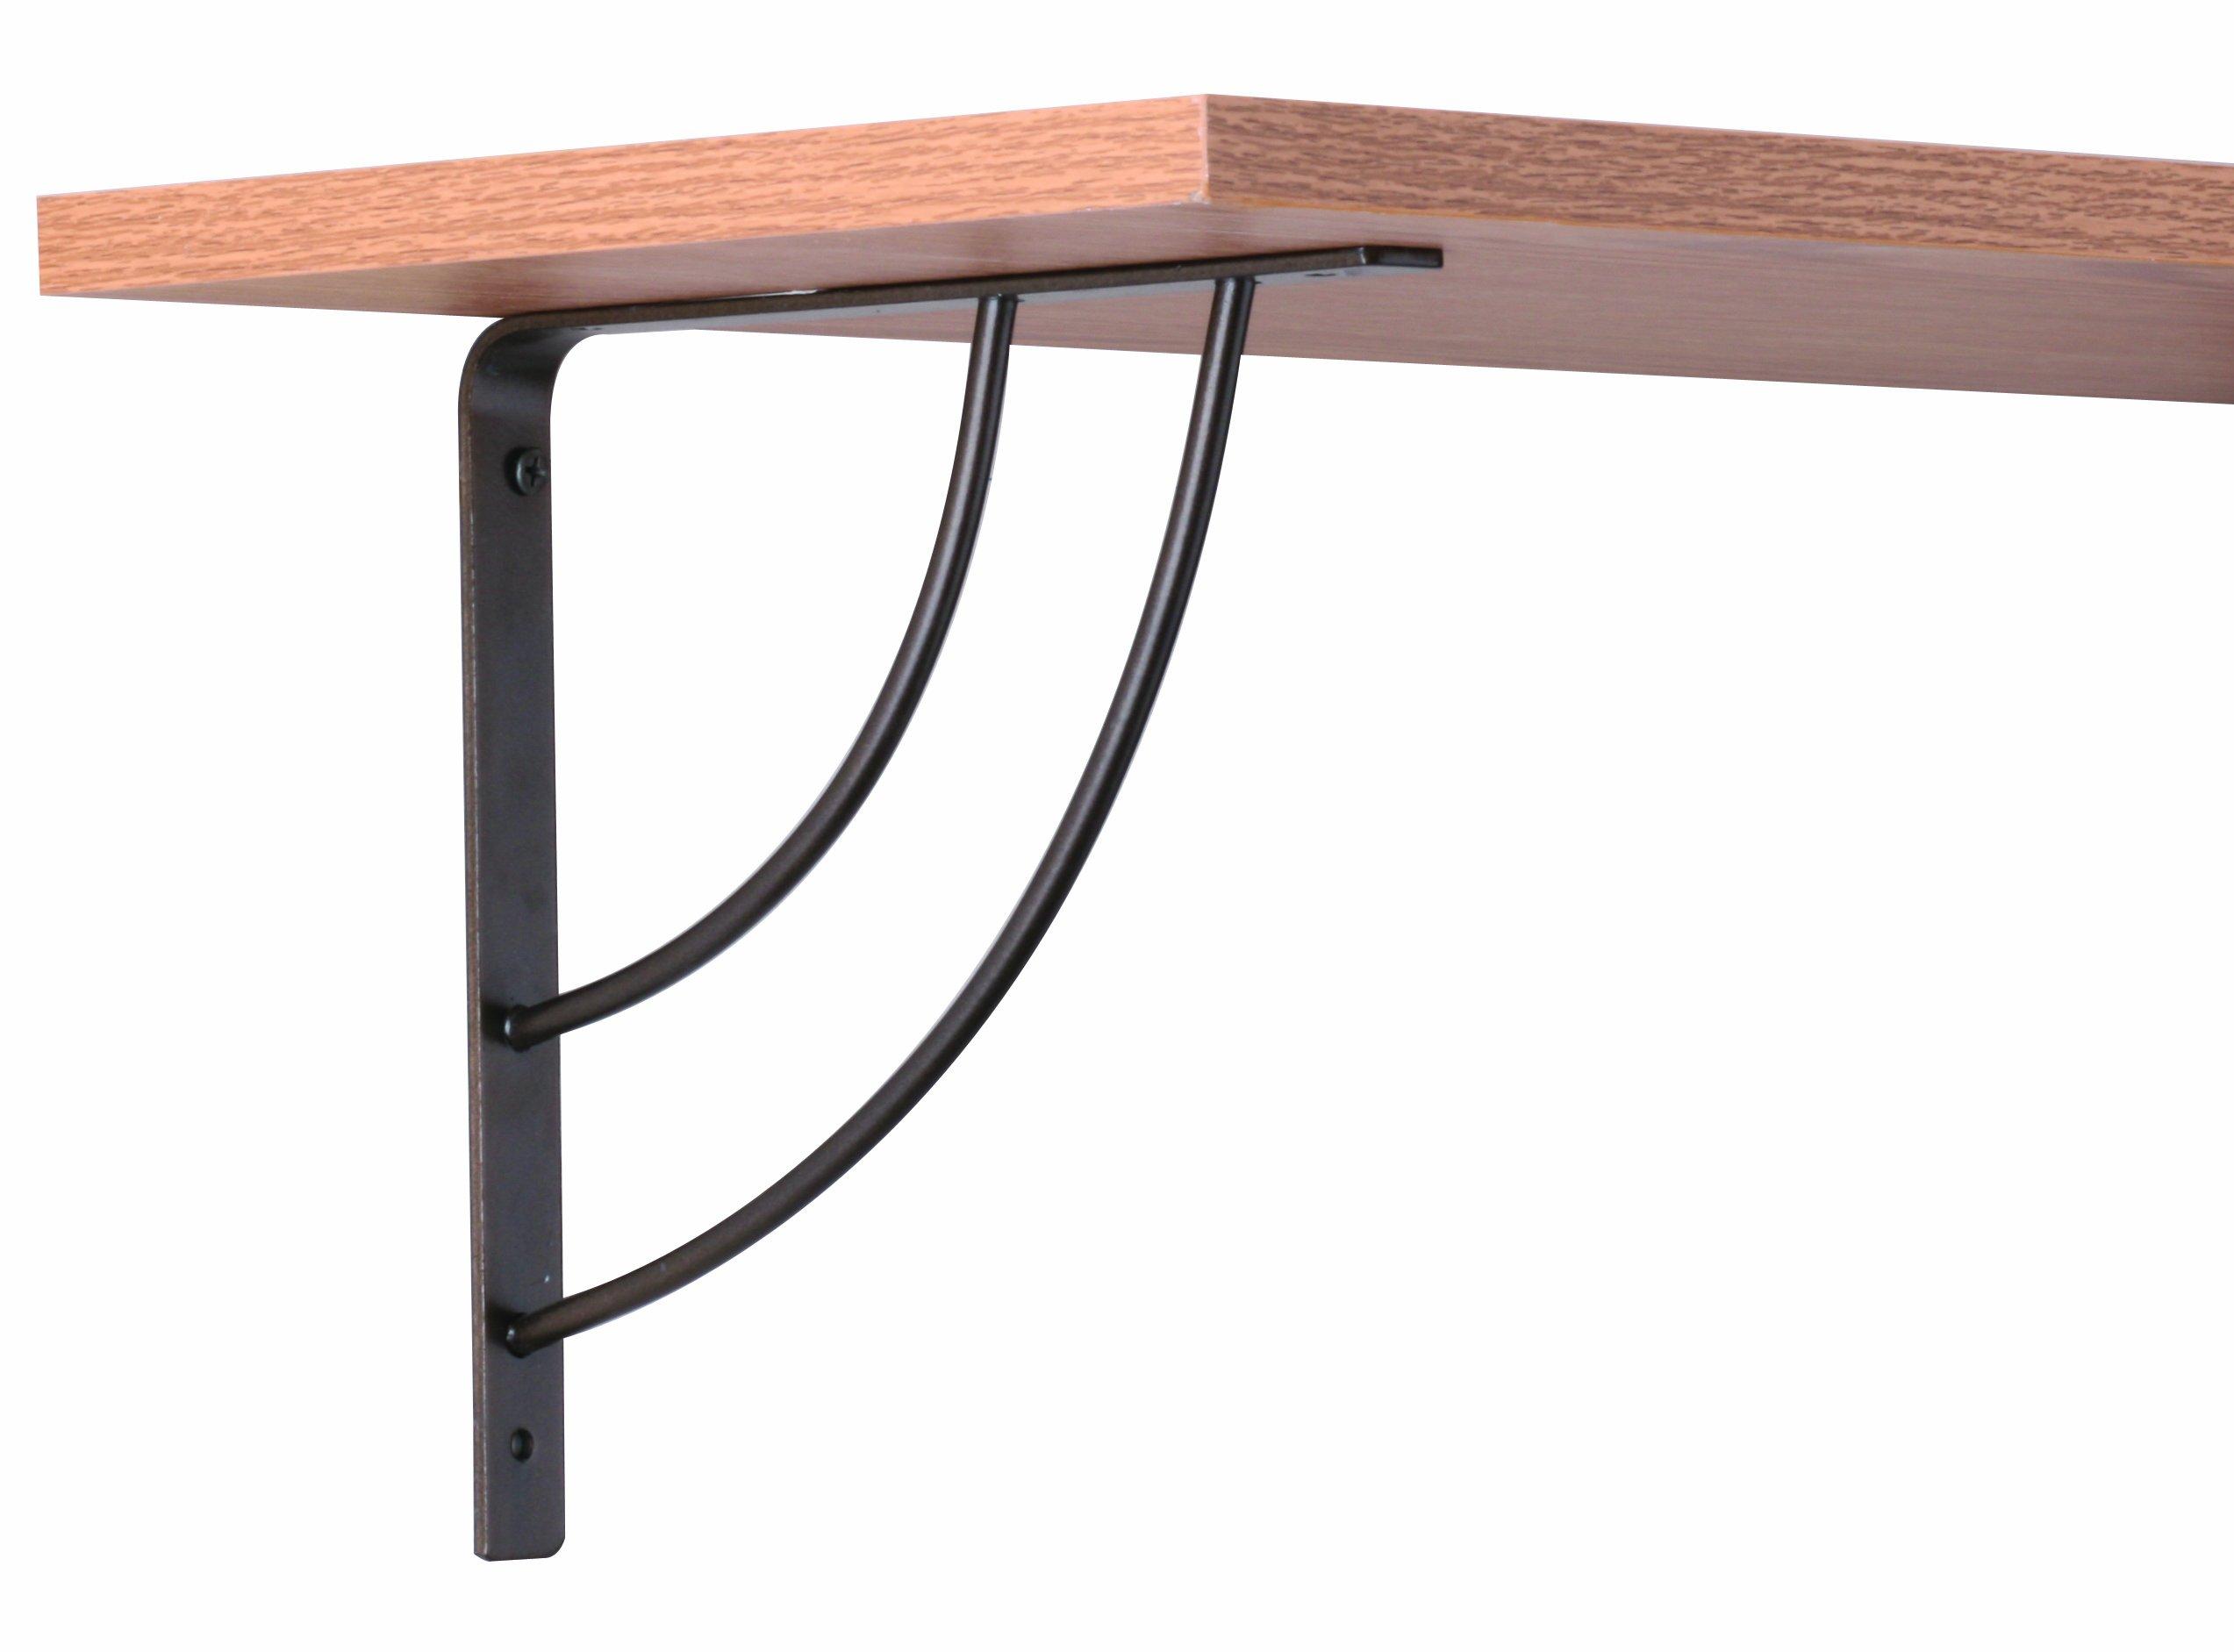 John Sterling Milano Style Decorative Shelf Bracket, 8-inch, Bronze, RP-0087-8BRZ